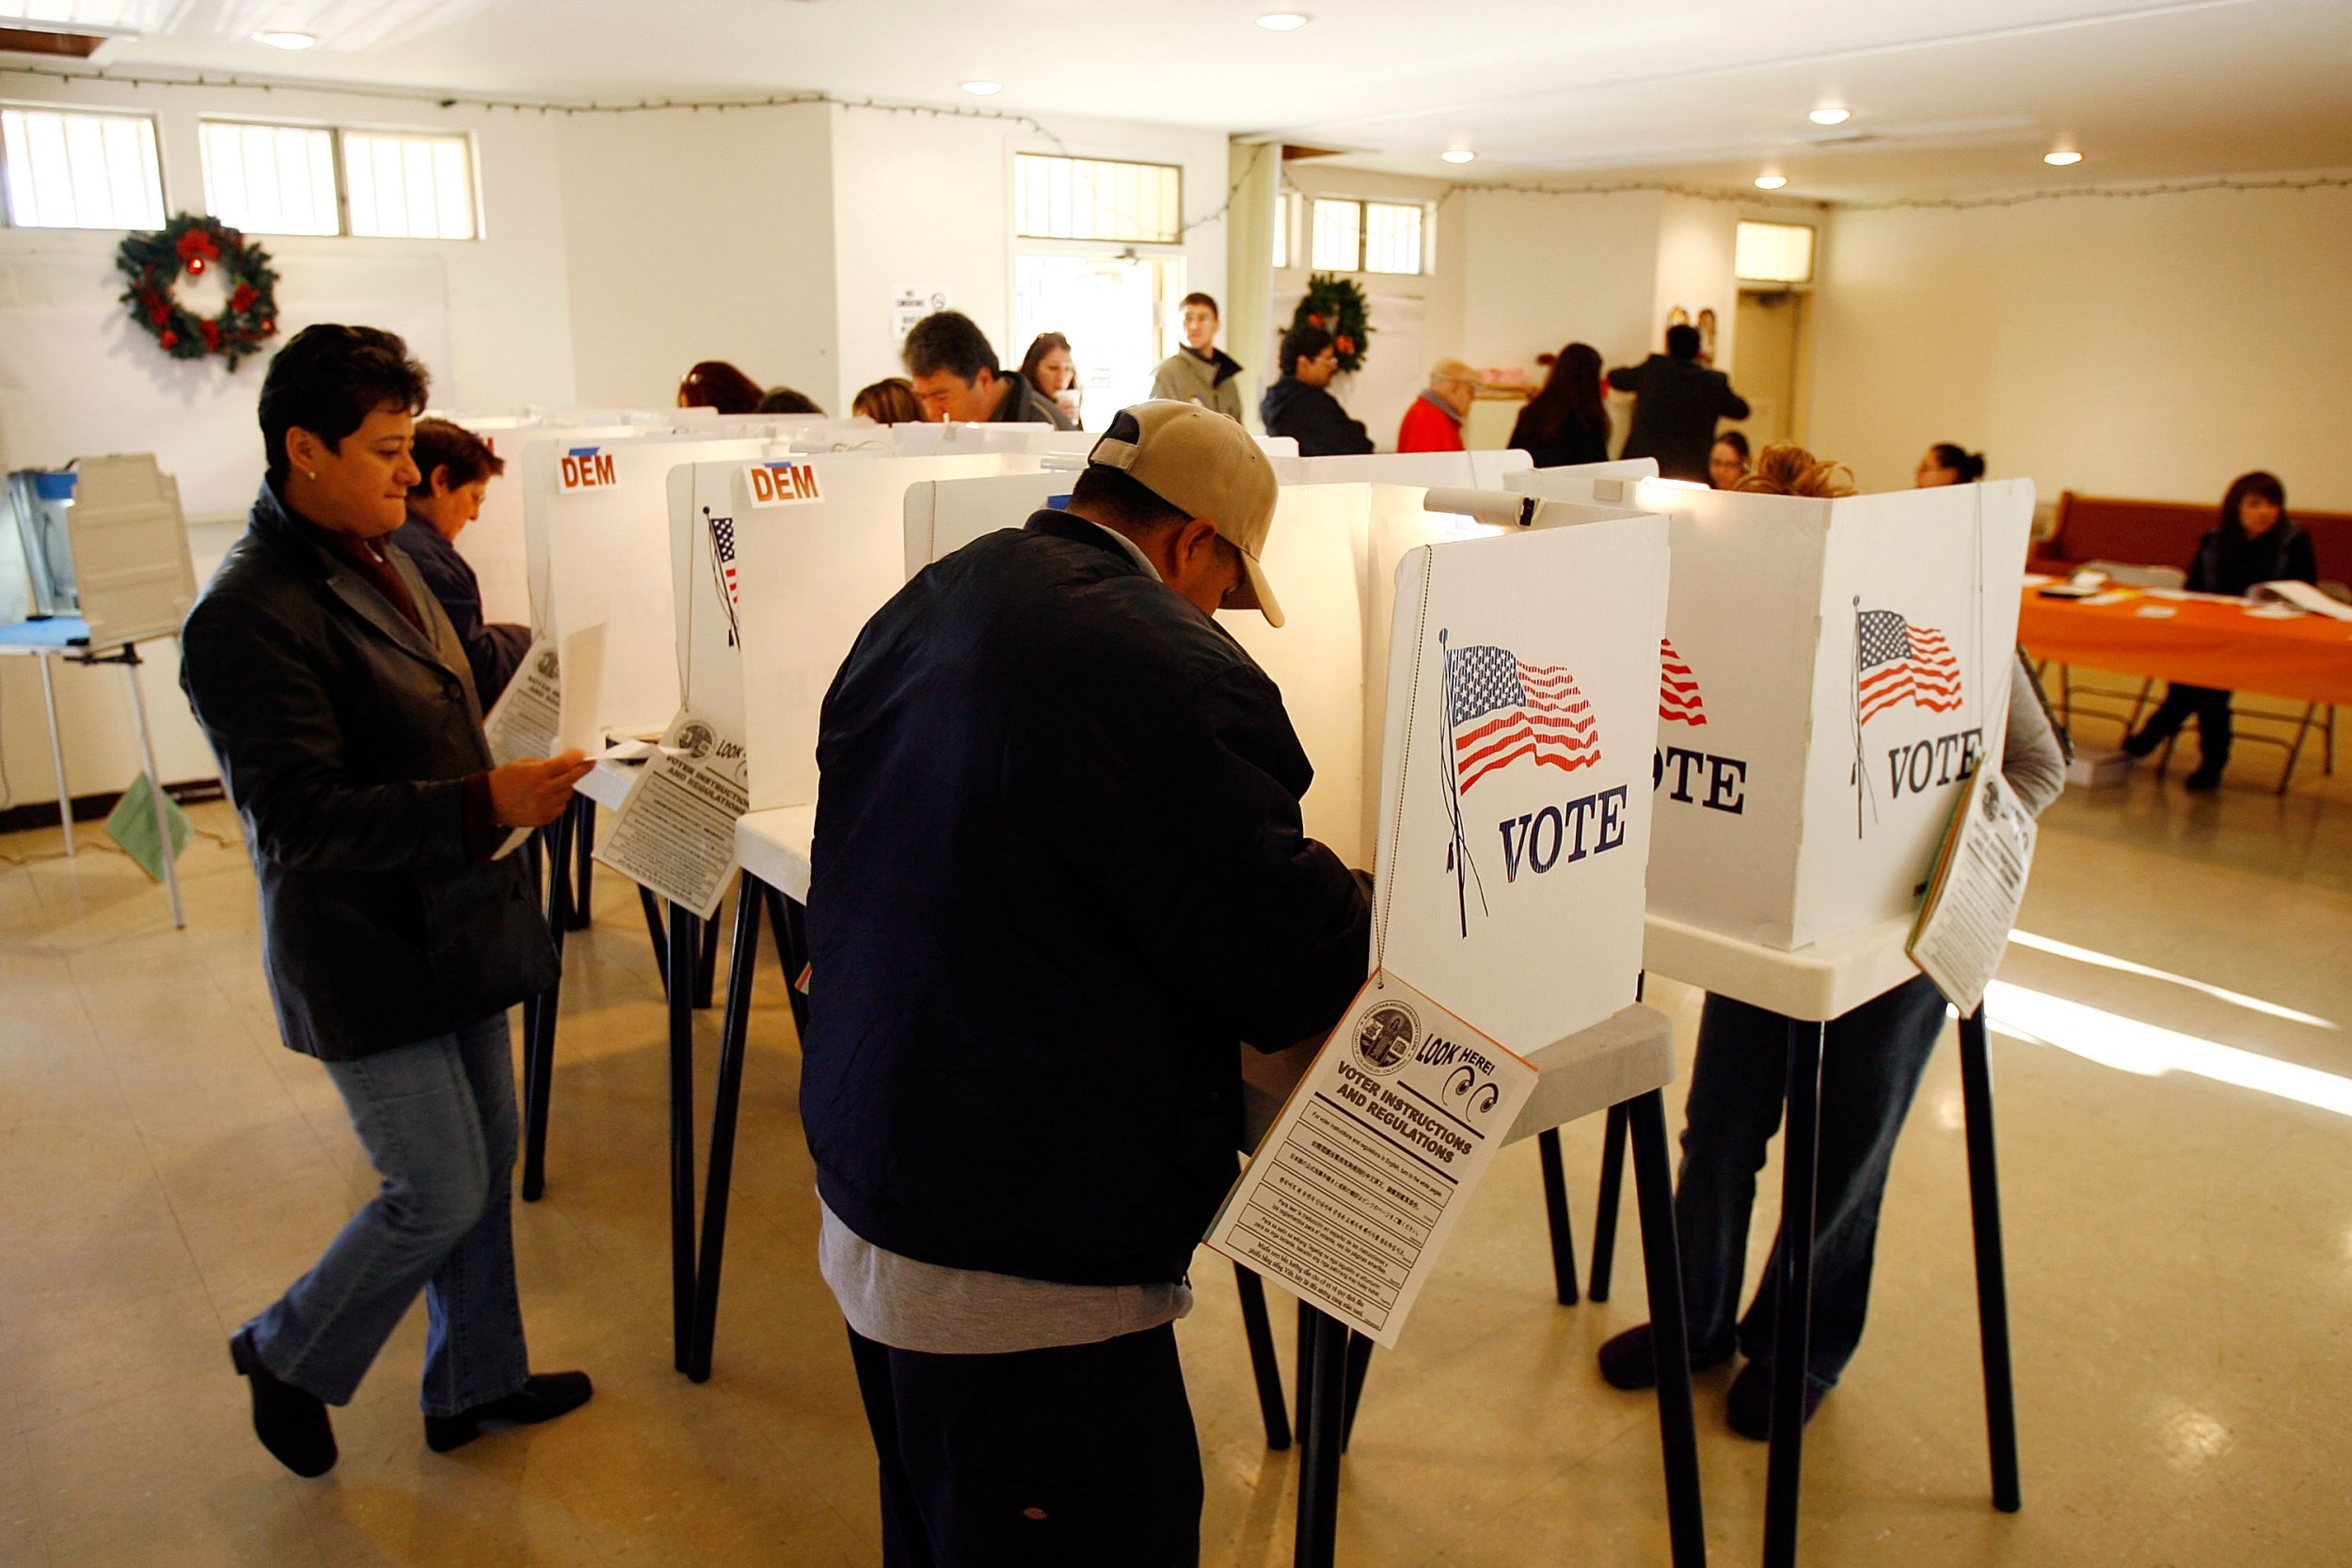 where to vote - photo #31